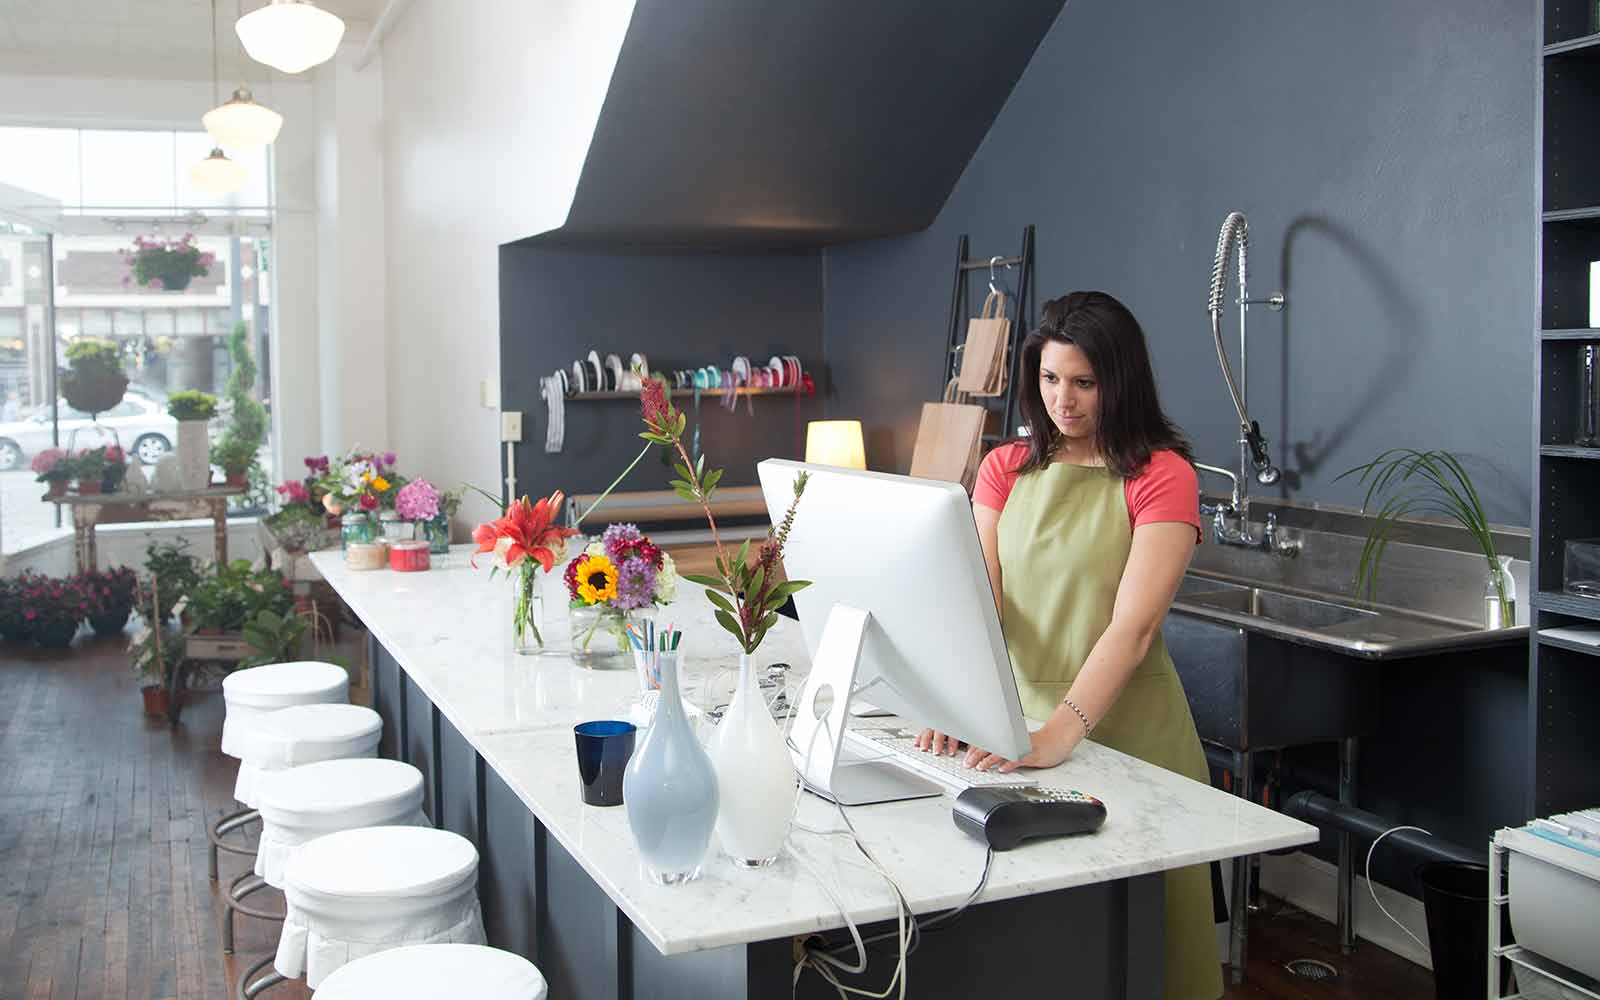 female florist reading business cash advance faq on computer